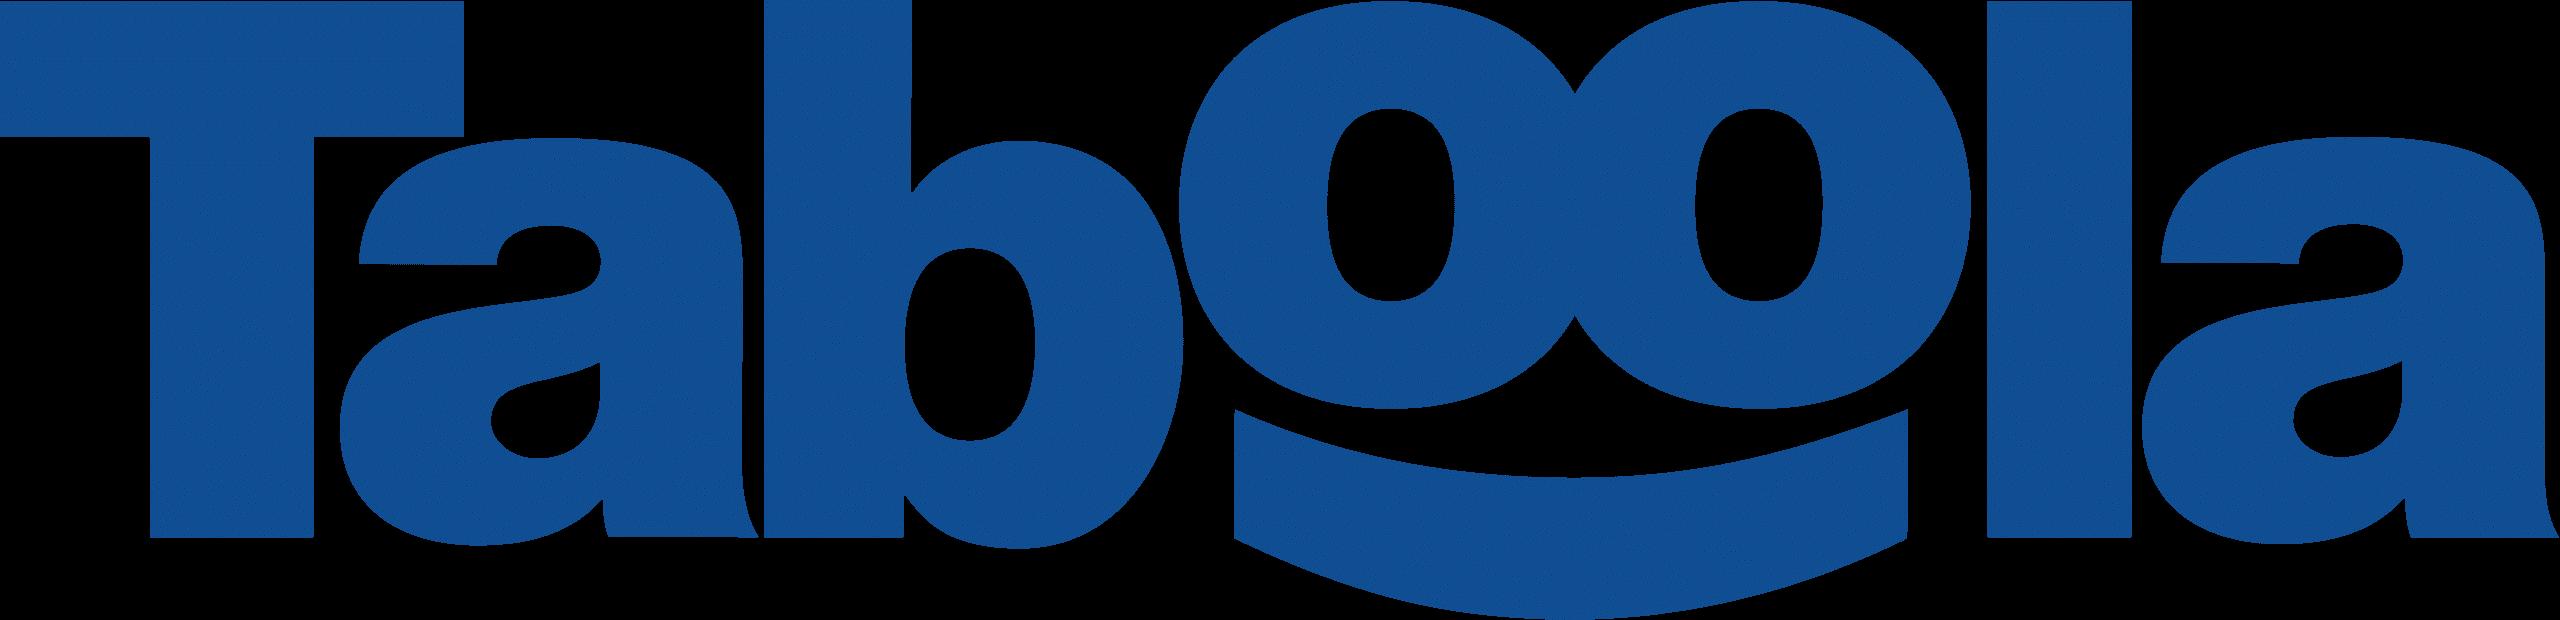 Taboola Alternative Ad Platforms